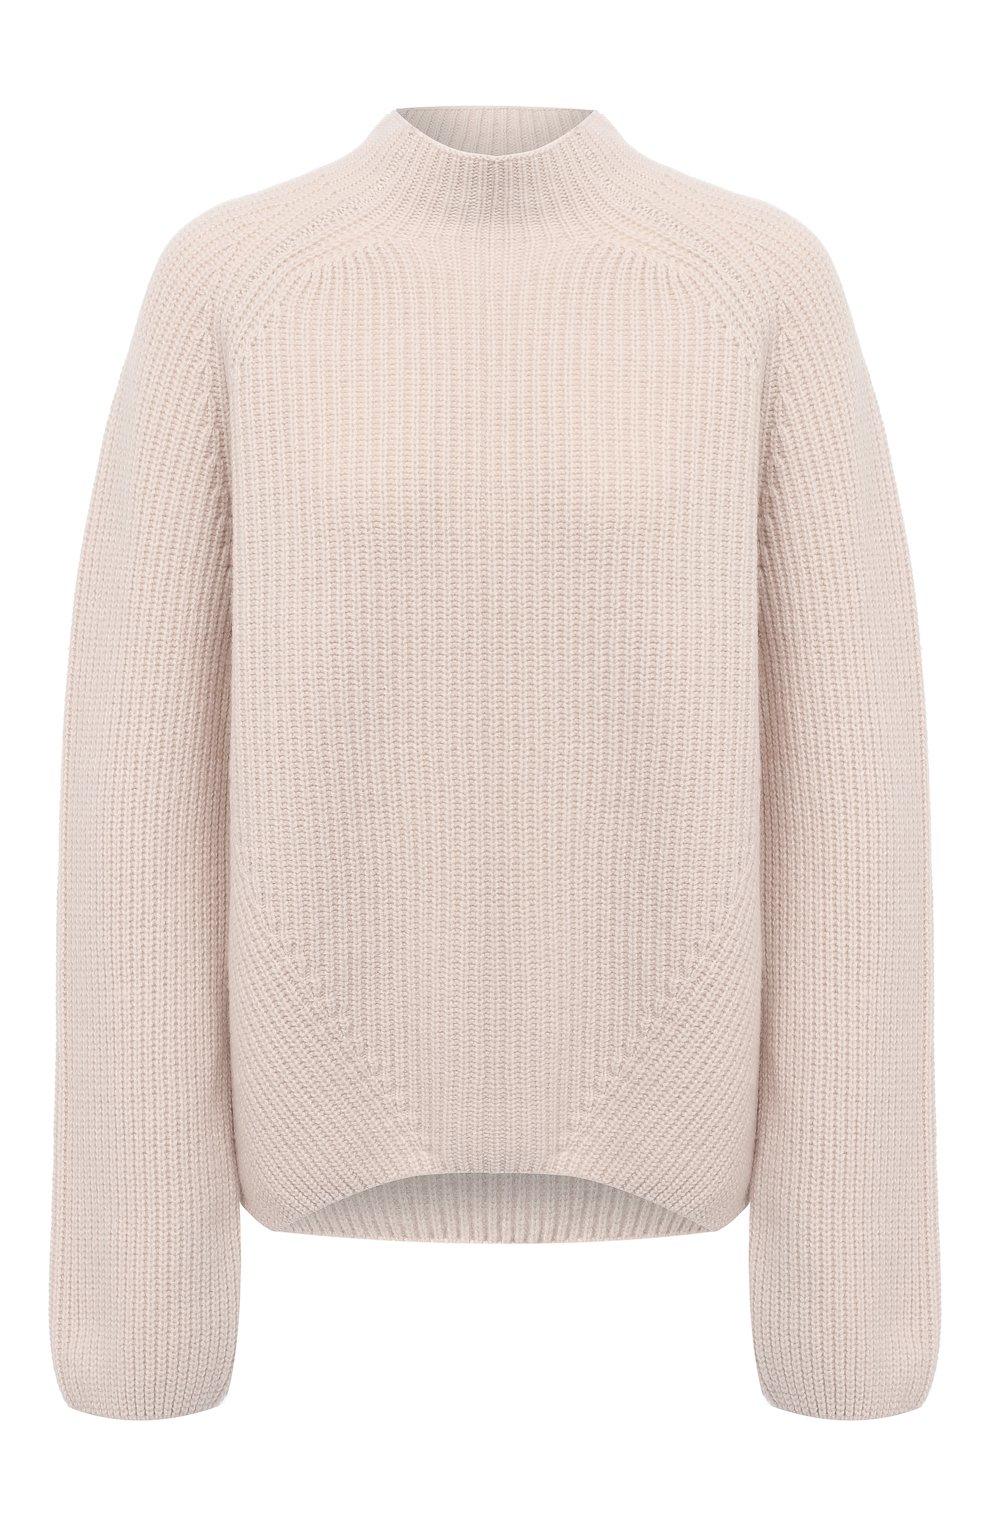 Женский свитер из шерсти и кашемира FORTE_FORTE светло-бежевого цвета, арт. 7845 | Фото 1